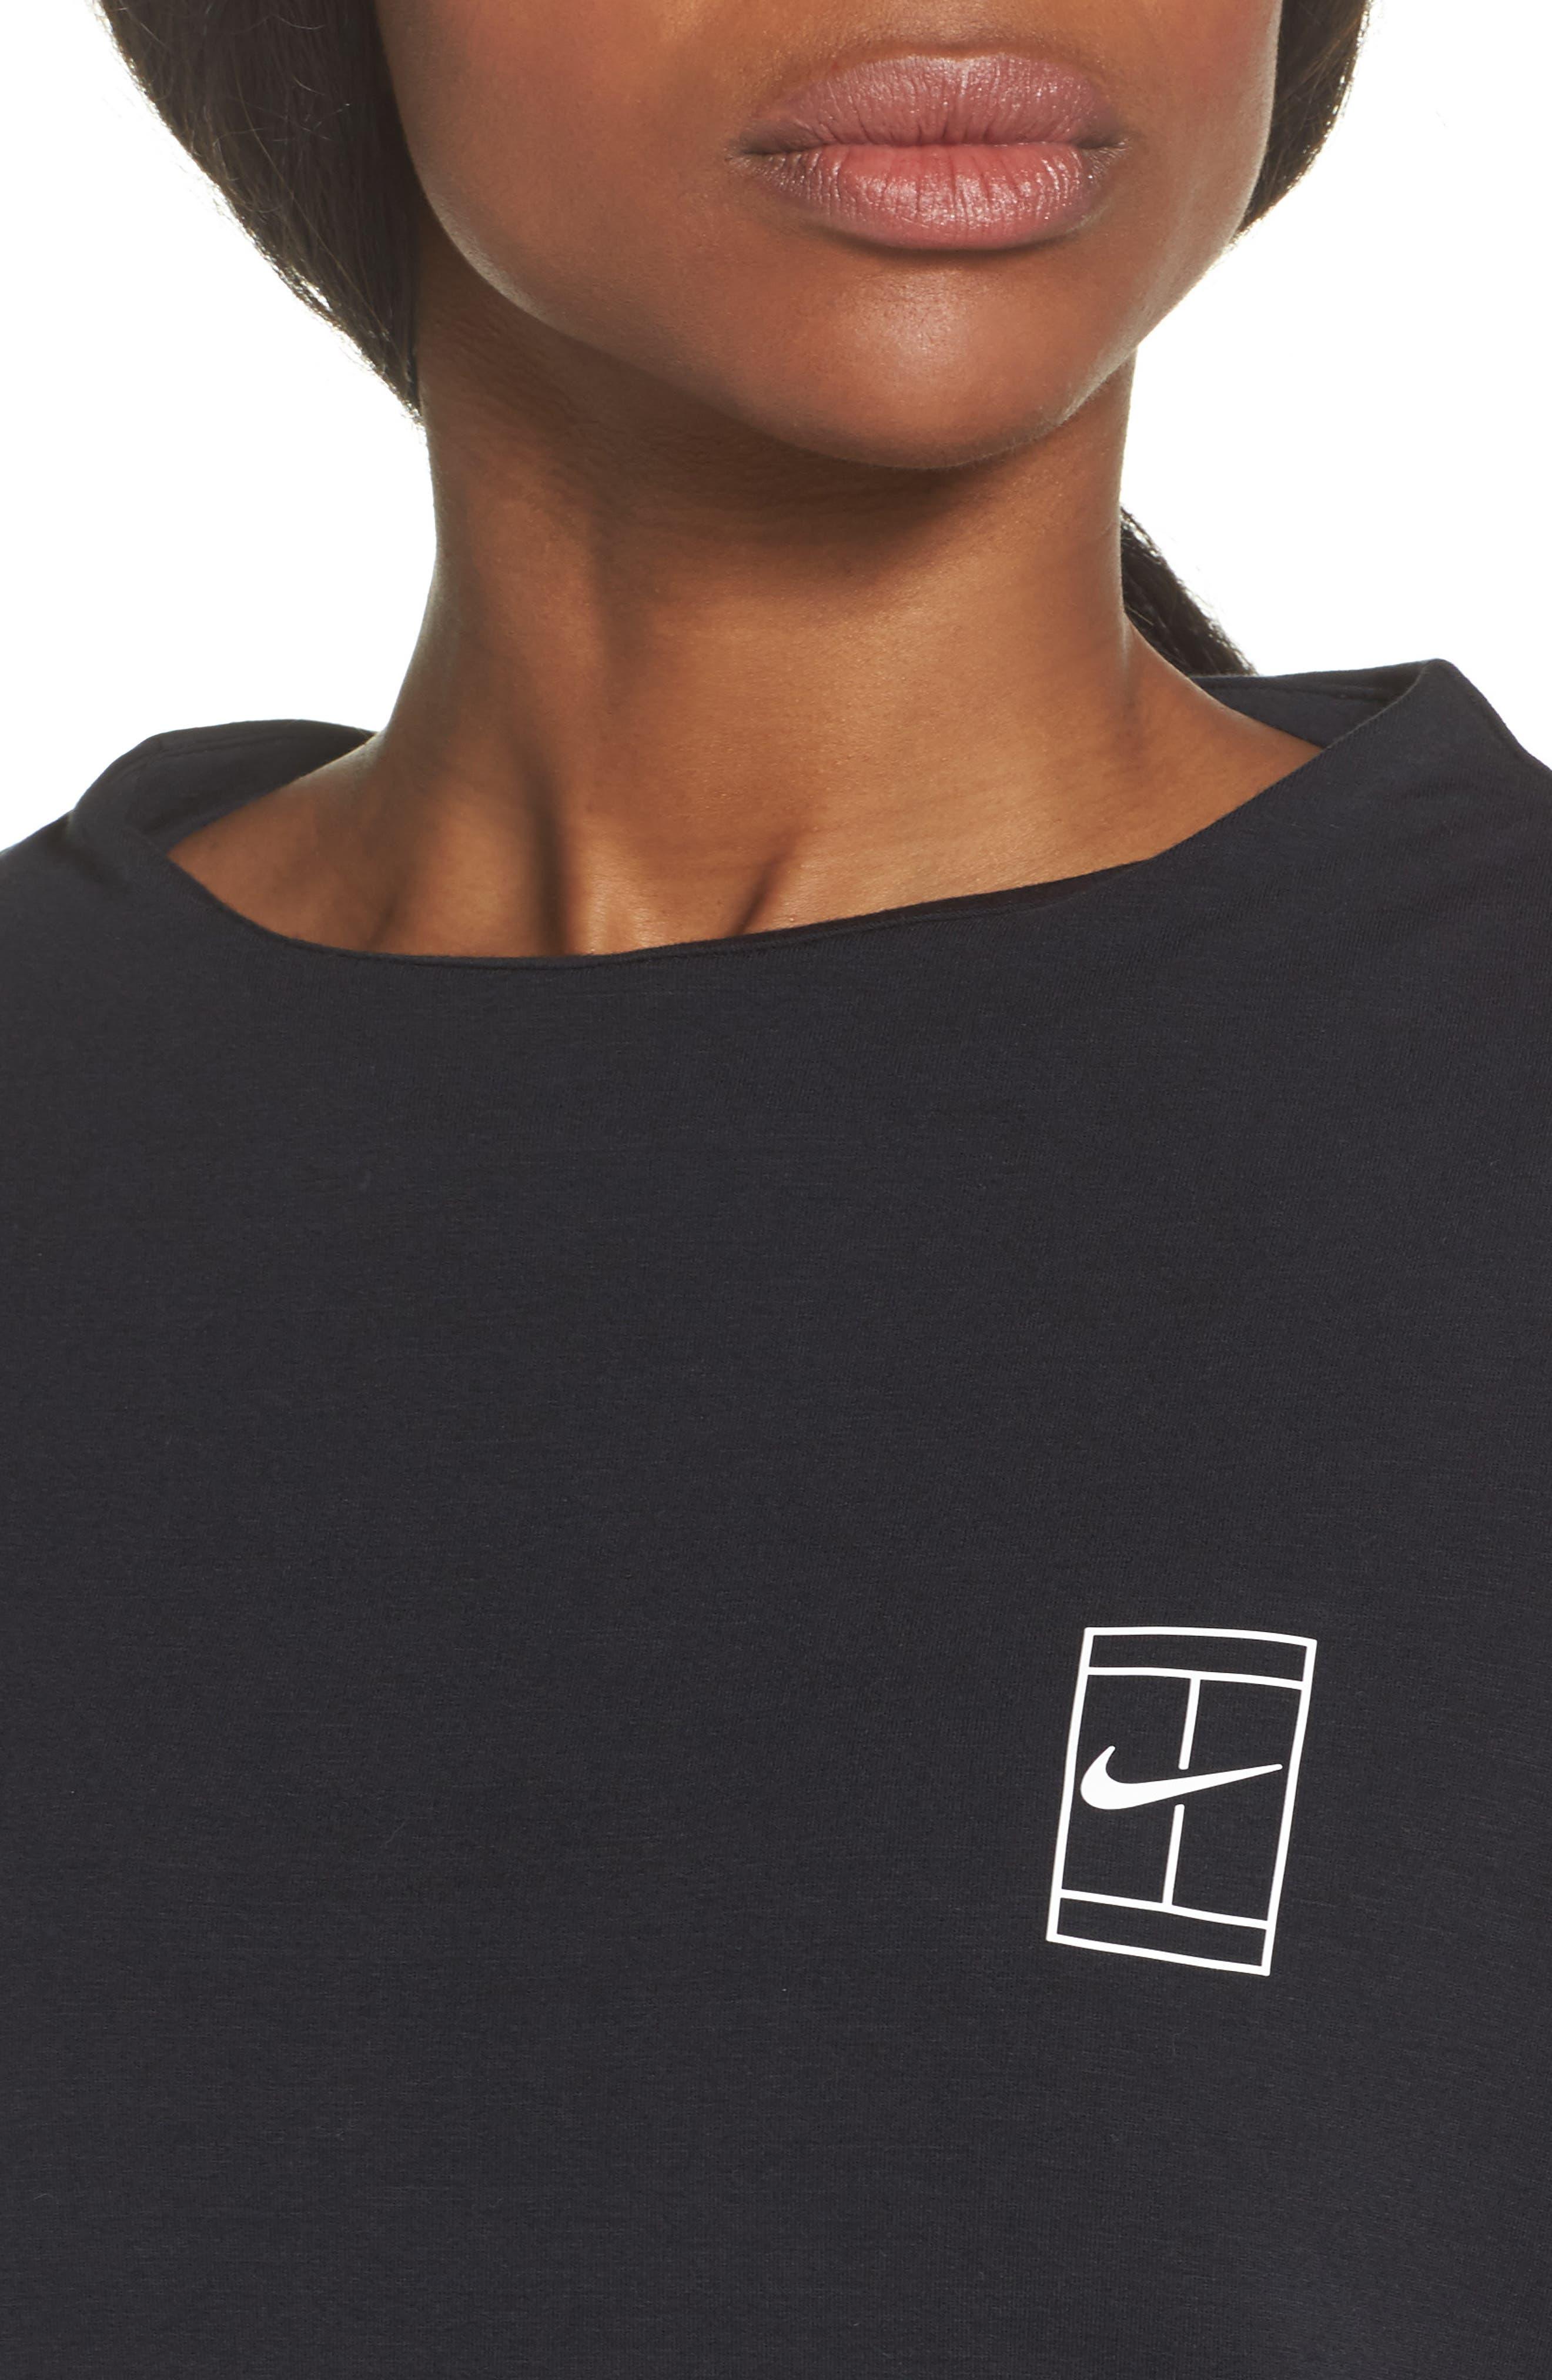 Court Dri-FIT Long Sleeve Tennis Top,                             Alternate thumbnail 4, color,                             Black/ White